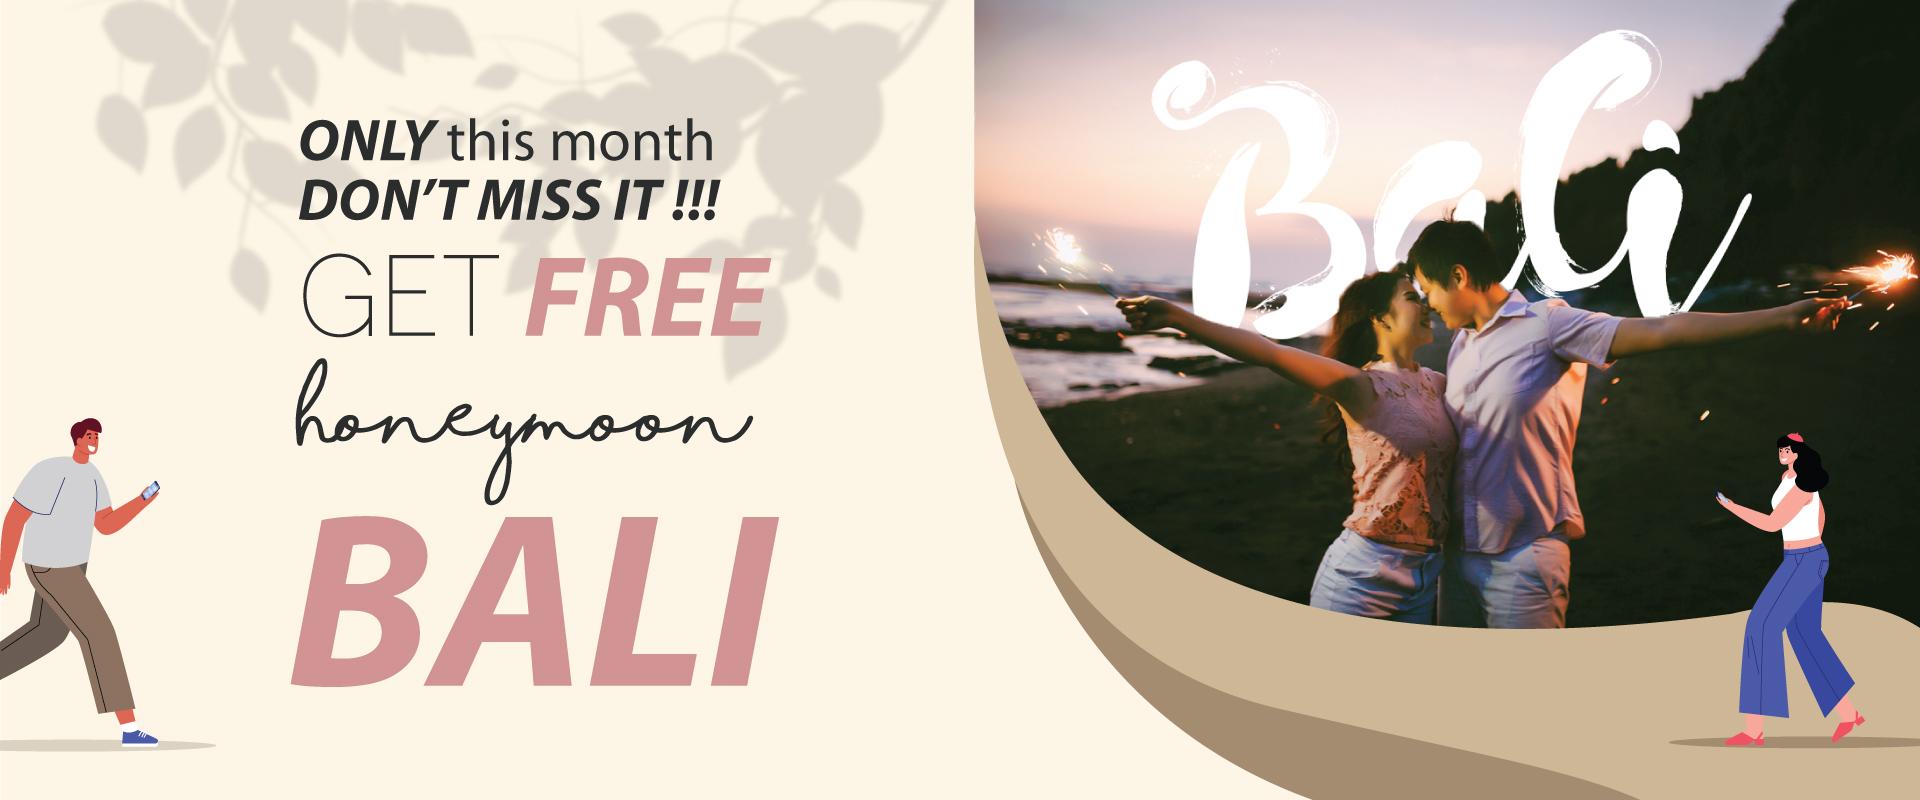 BUlan CINta dapatkan FREE Honeymoon ke BALI